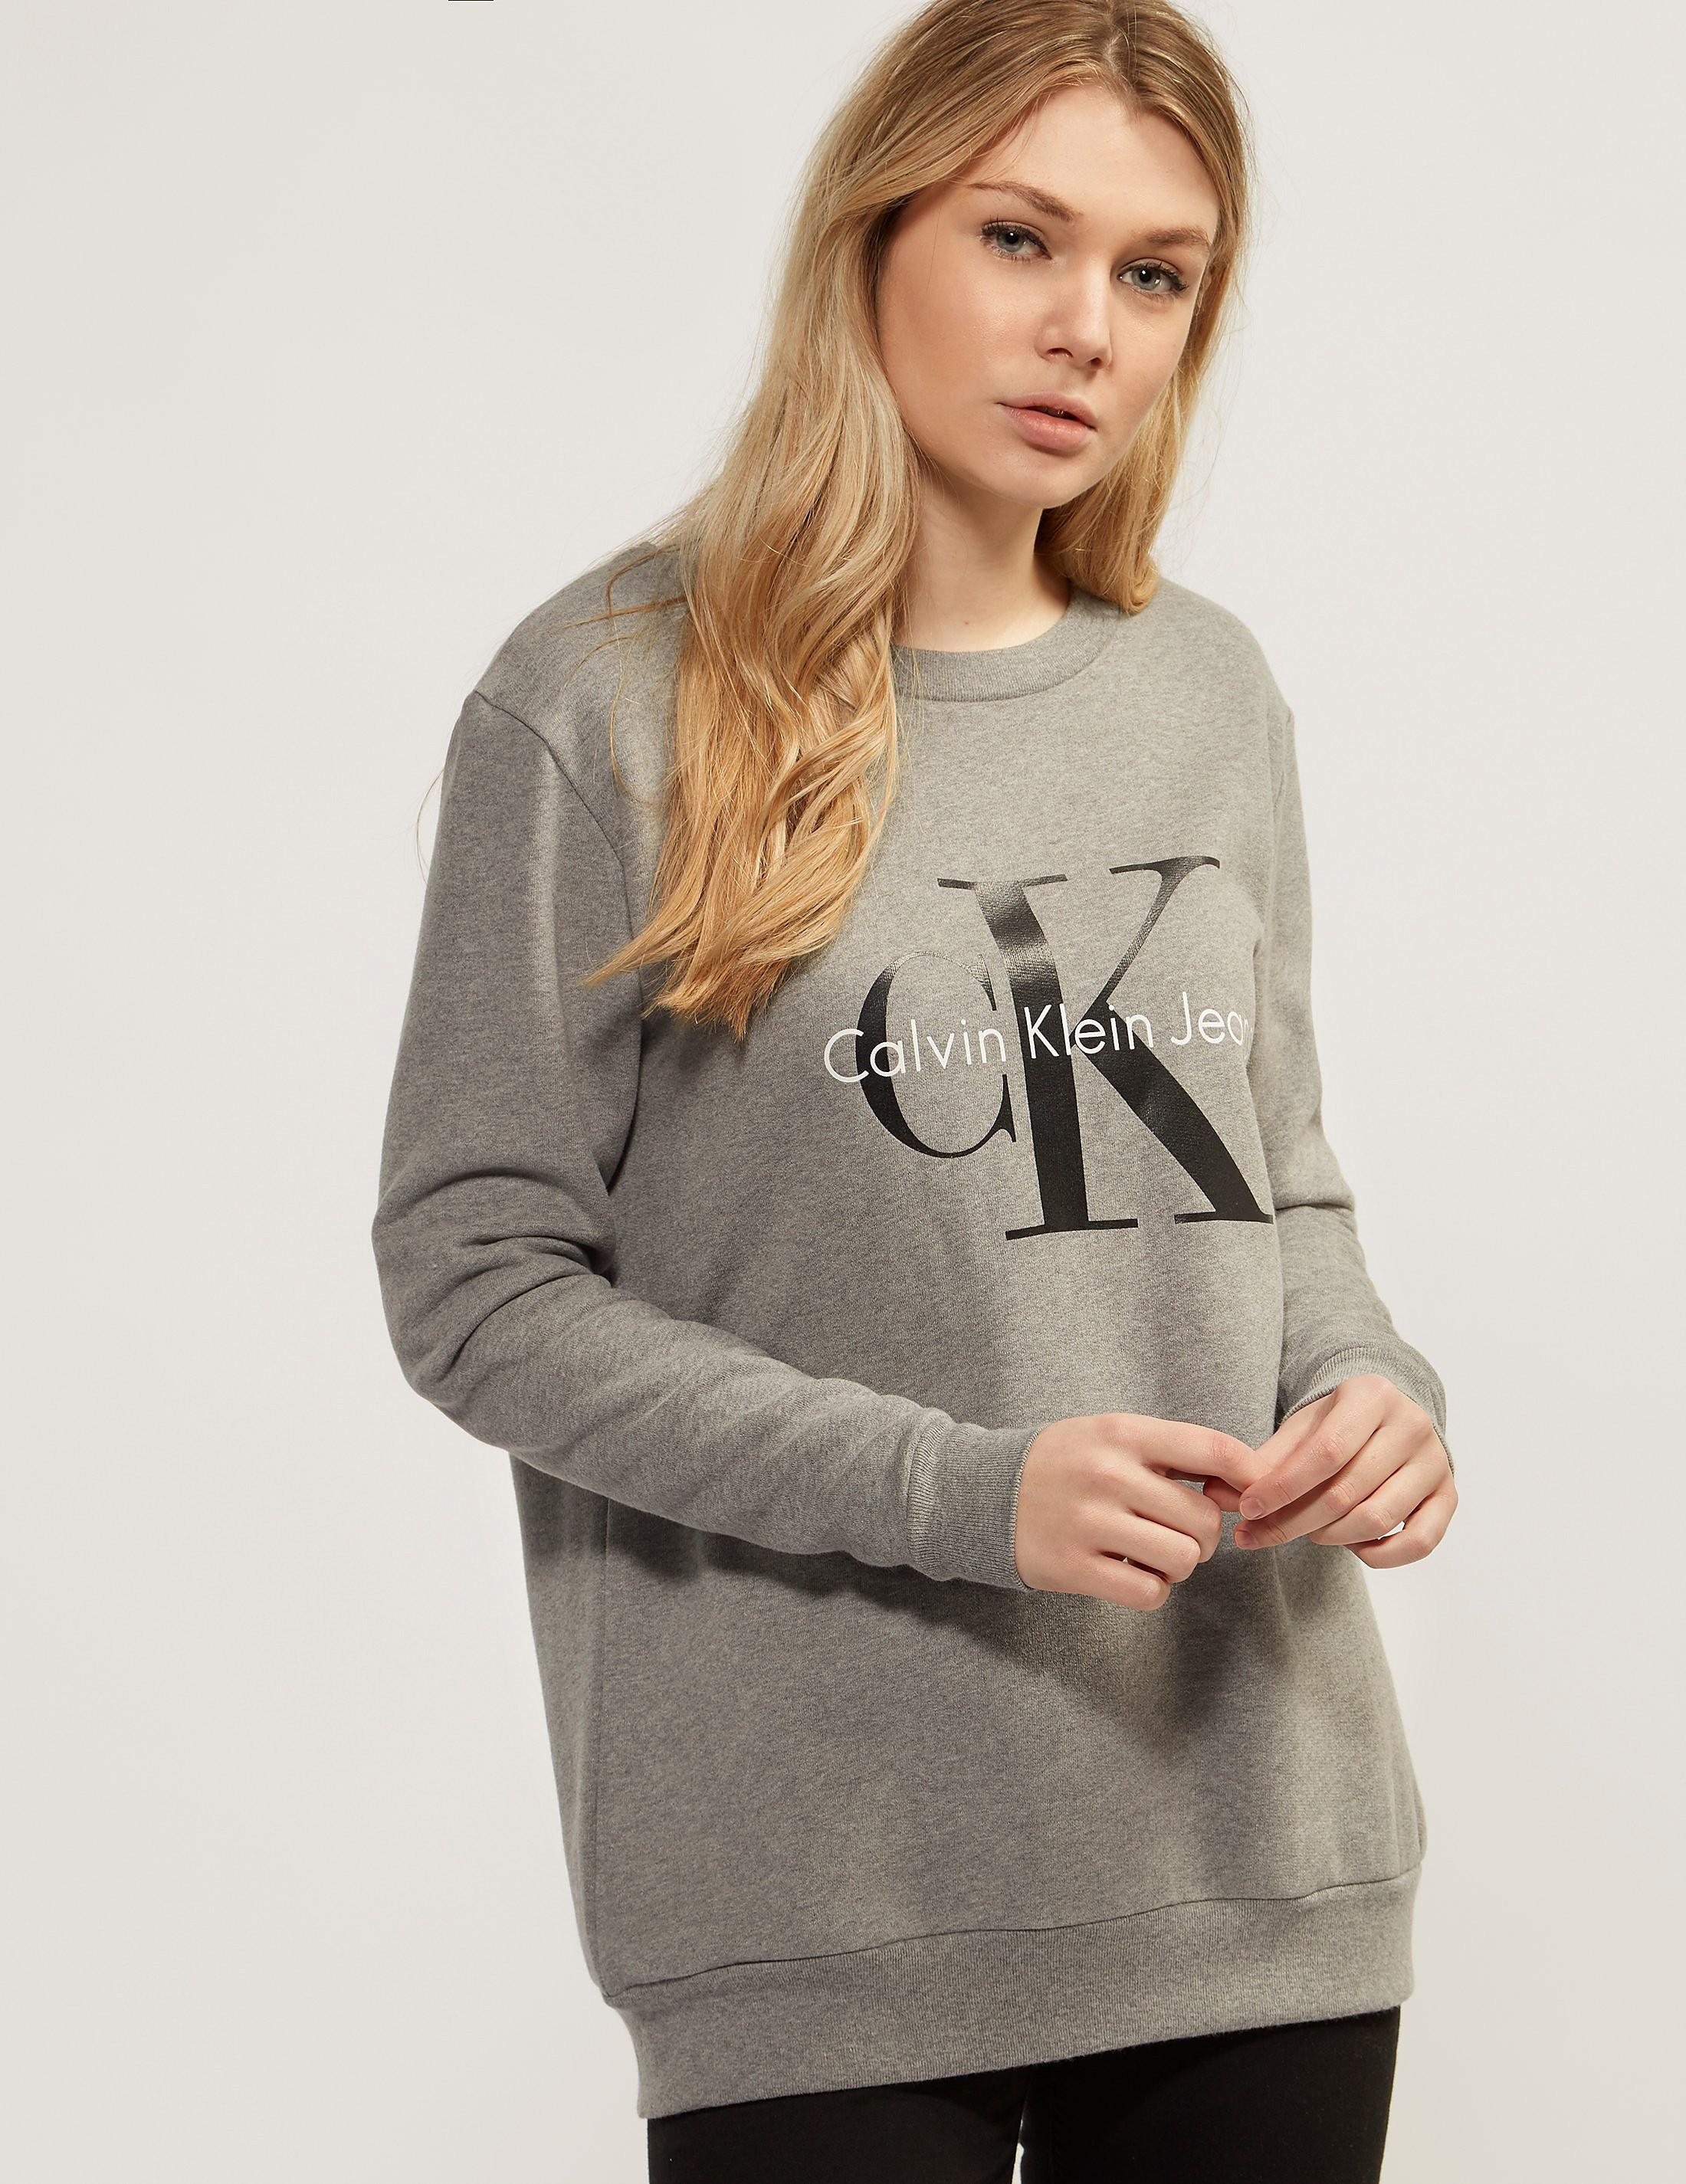 Calvin Klein Crew Logo Sweatshirt